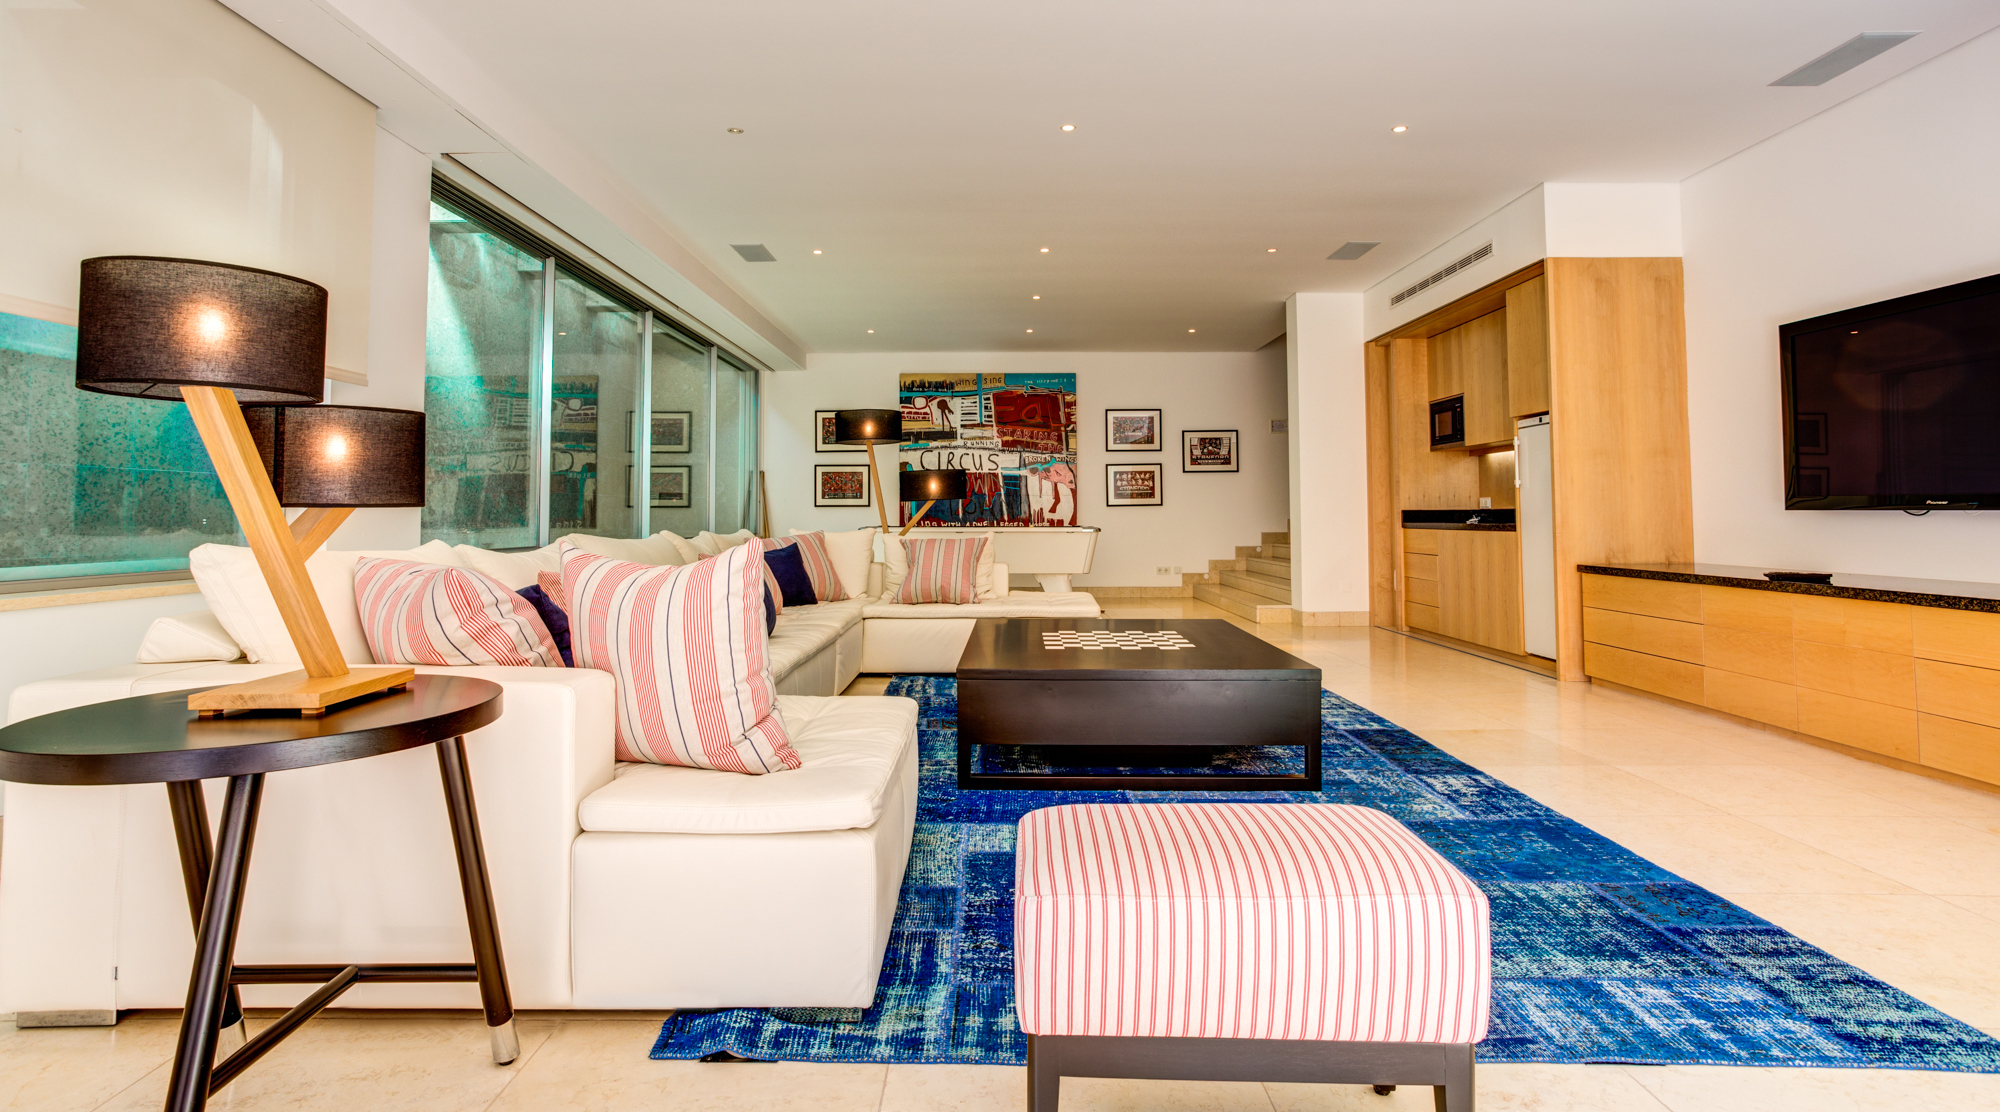 Villa Moon Sone, 5 bedroom prestige villa in Quinta do Lago, Algarve,TV room.jpg